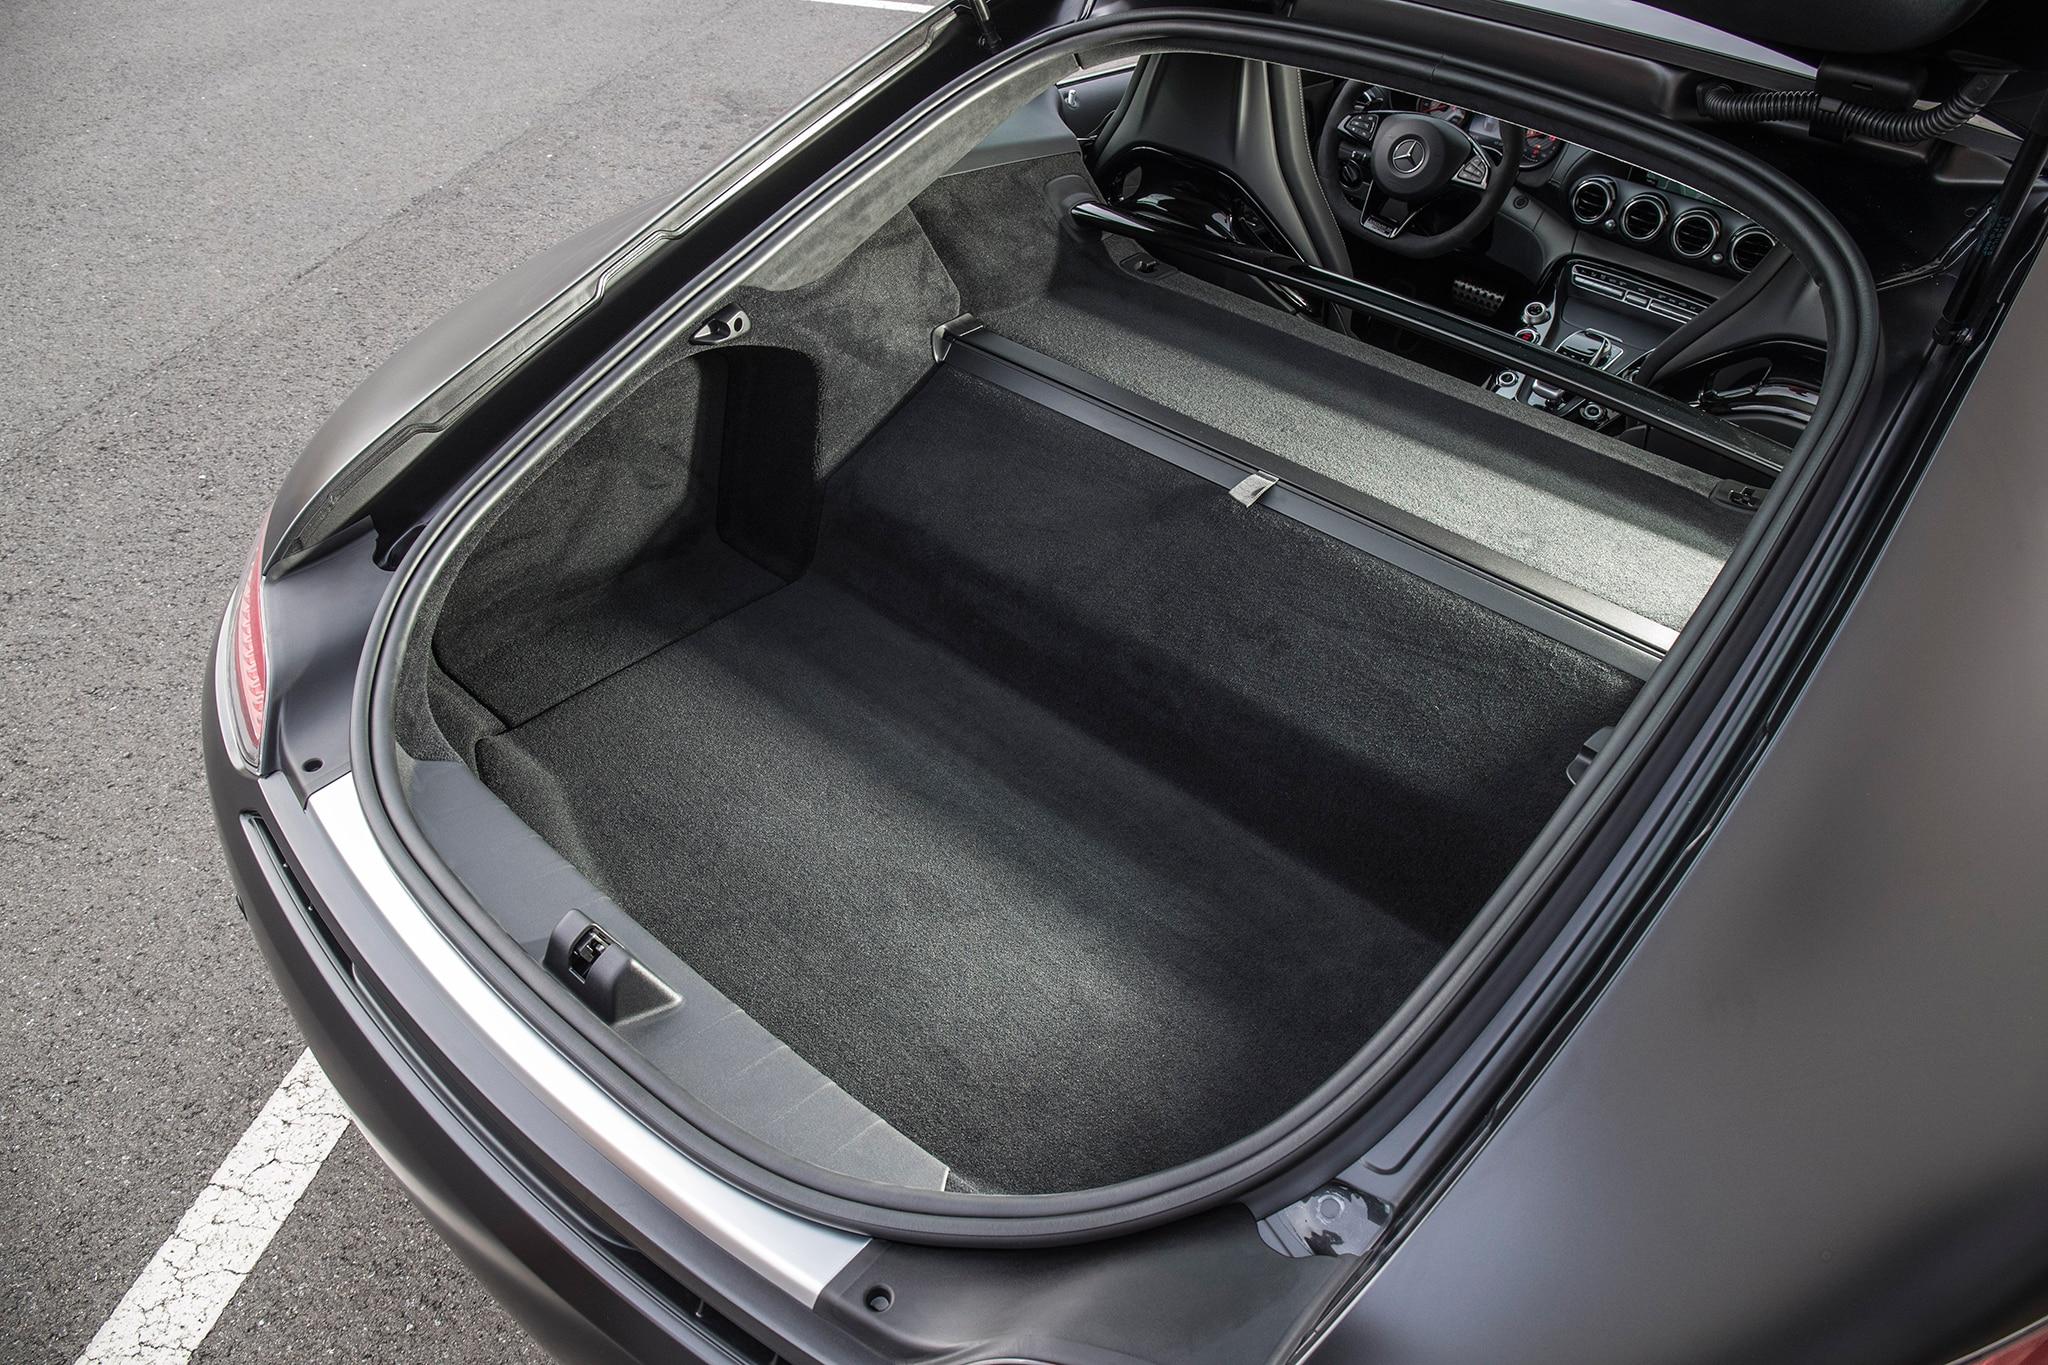 http://st.automobilemag.com/uploads/sites/11/2017/09/2018-Mercedes-AMG-GT-C-Edition-50-Roadster-cargo-space.jpg